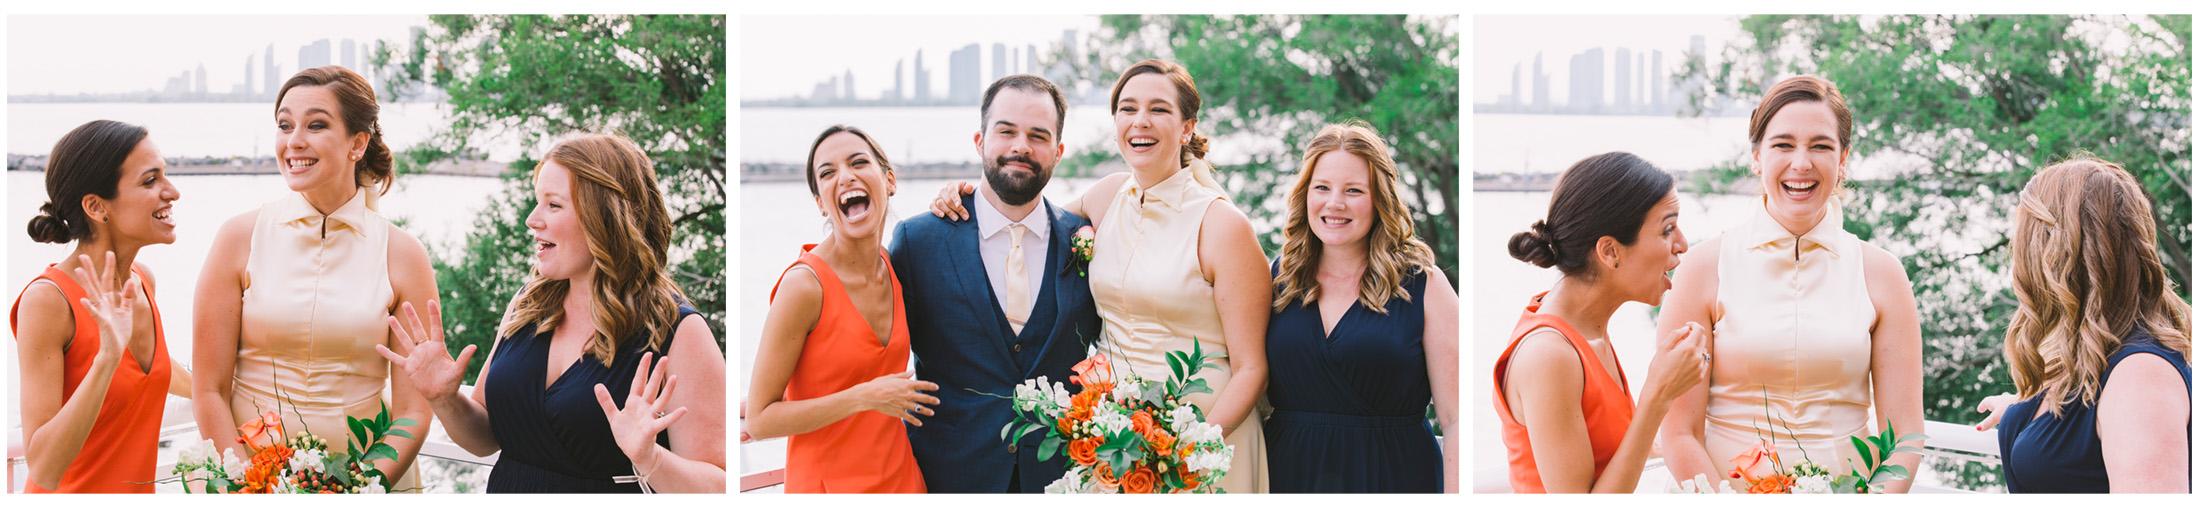 Wedding Party at the Toronto Argonaut Rowing Club